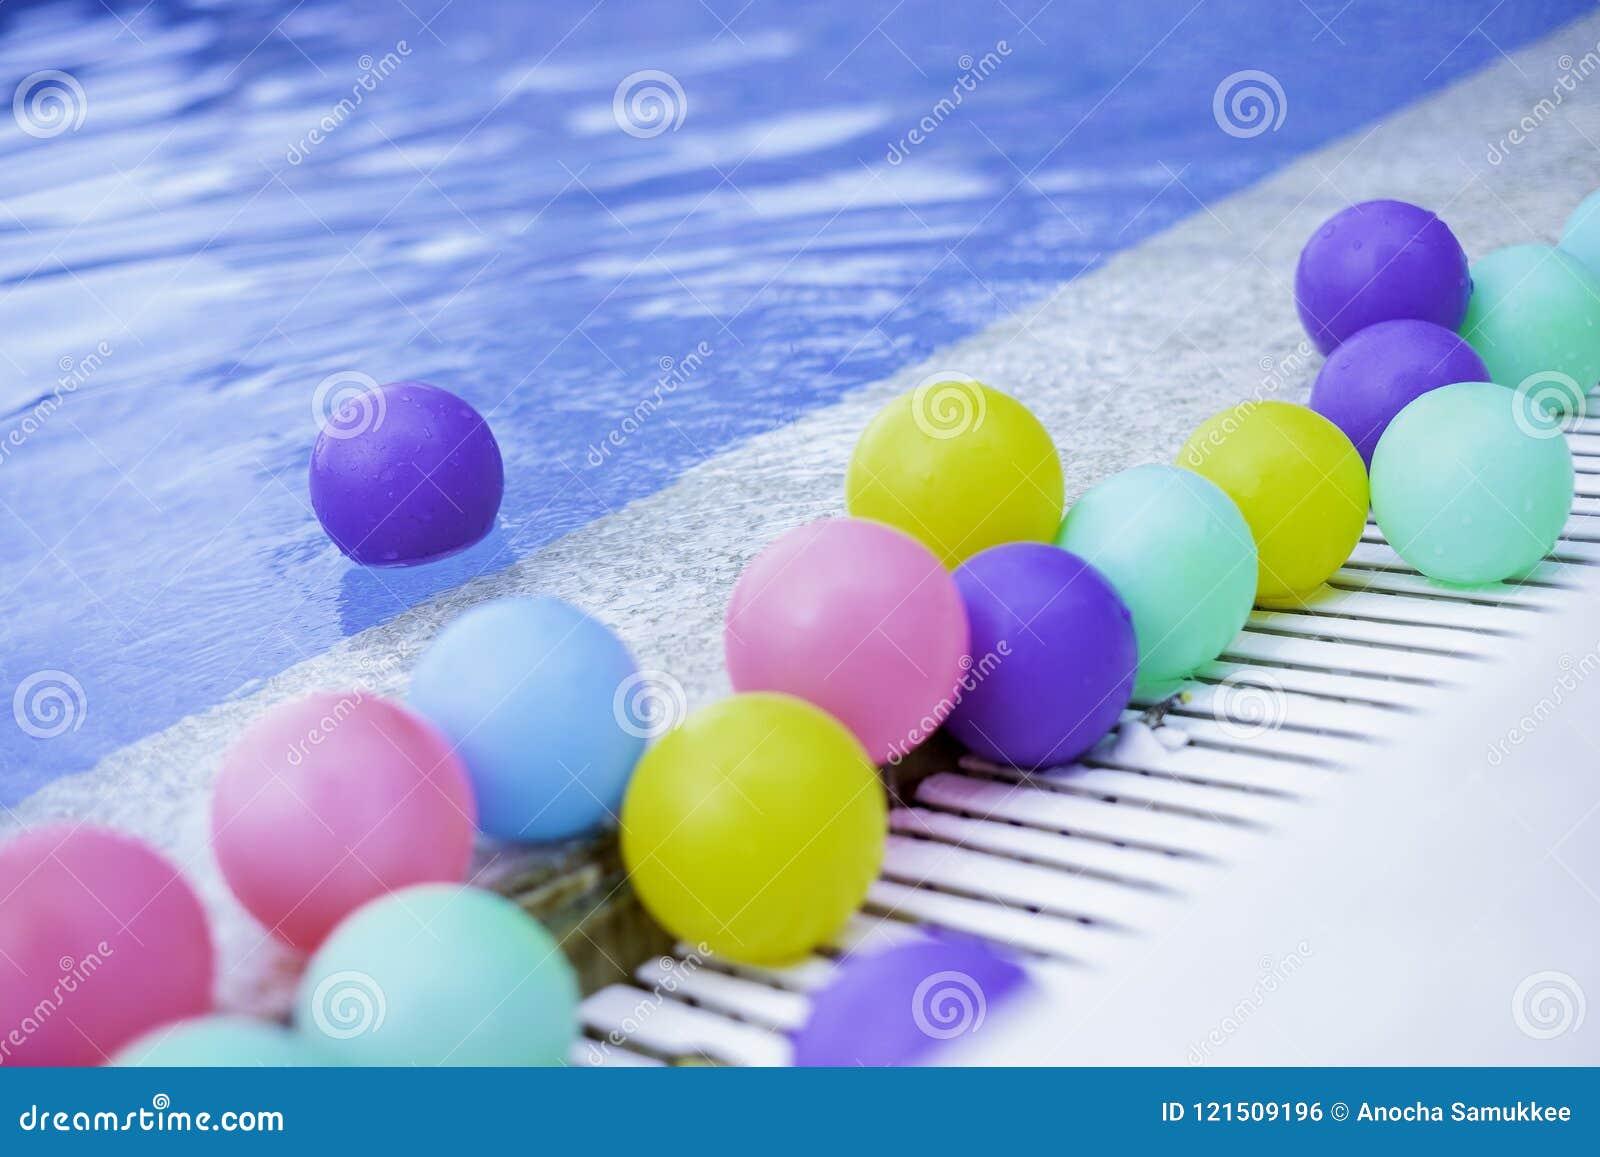 Bolas coloridas